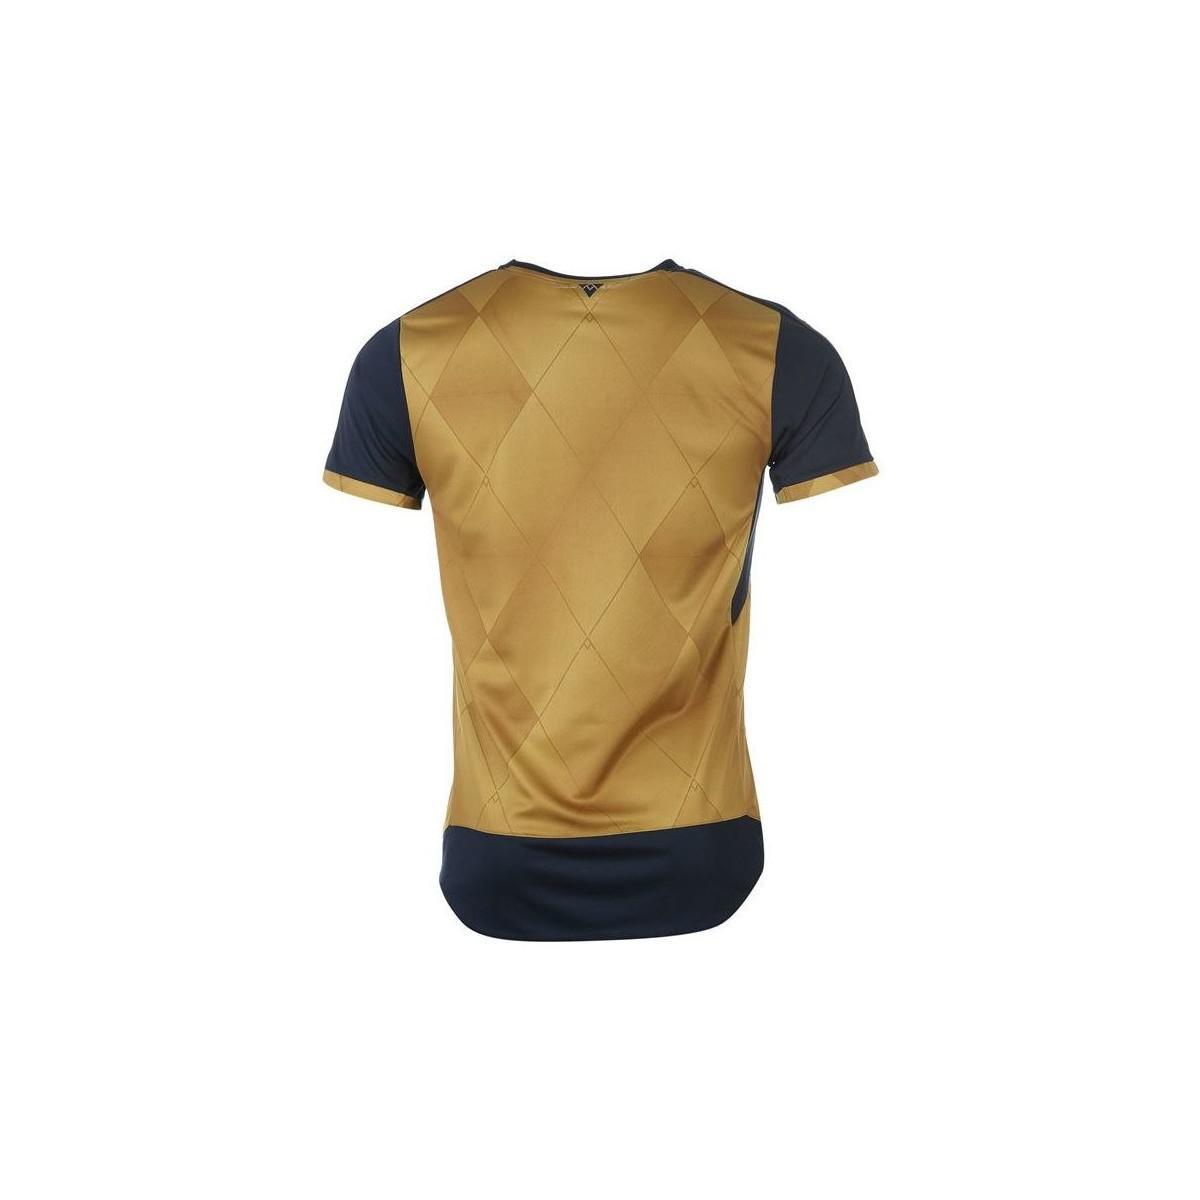 efc7bf820 PUMA 2015-2016 Arsenal Away Football Shirt (kids) Men s T Shirt In ...